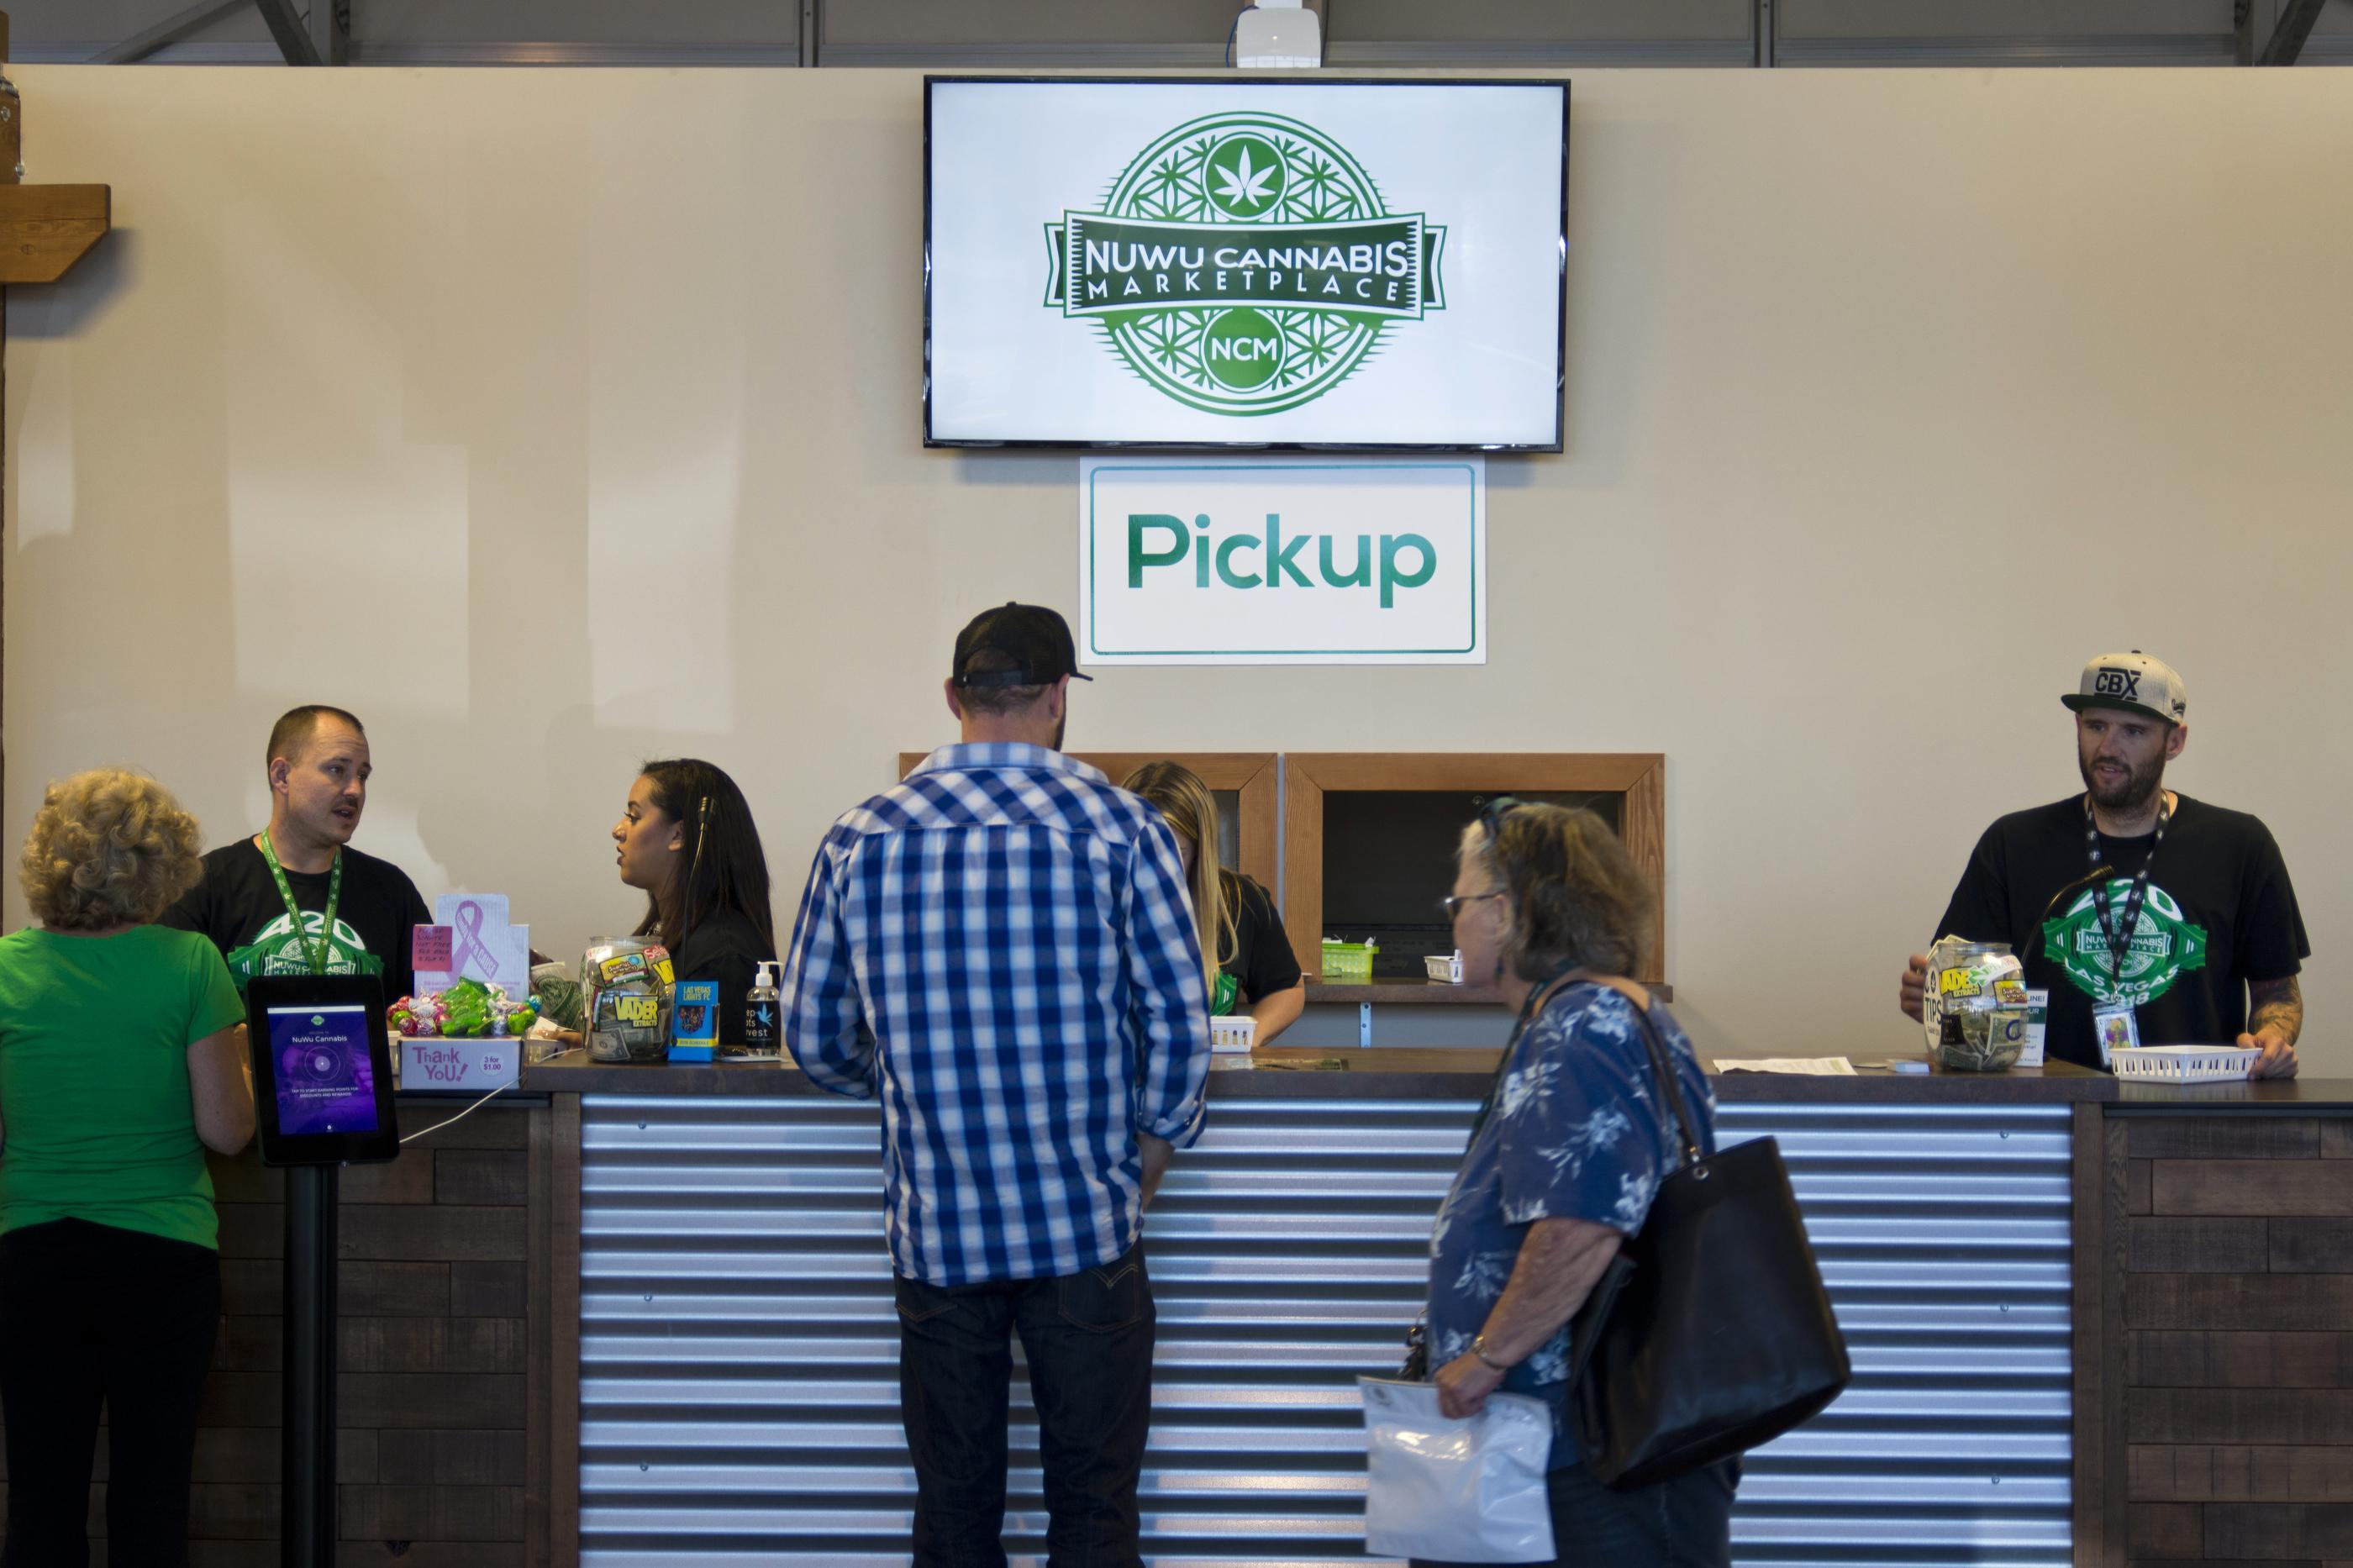 The Indy Explains: Can marijuana companies use banks?